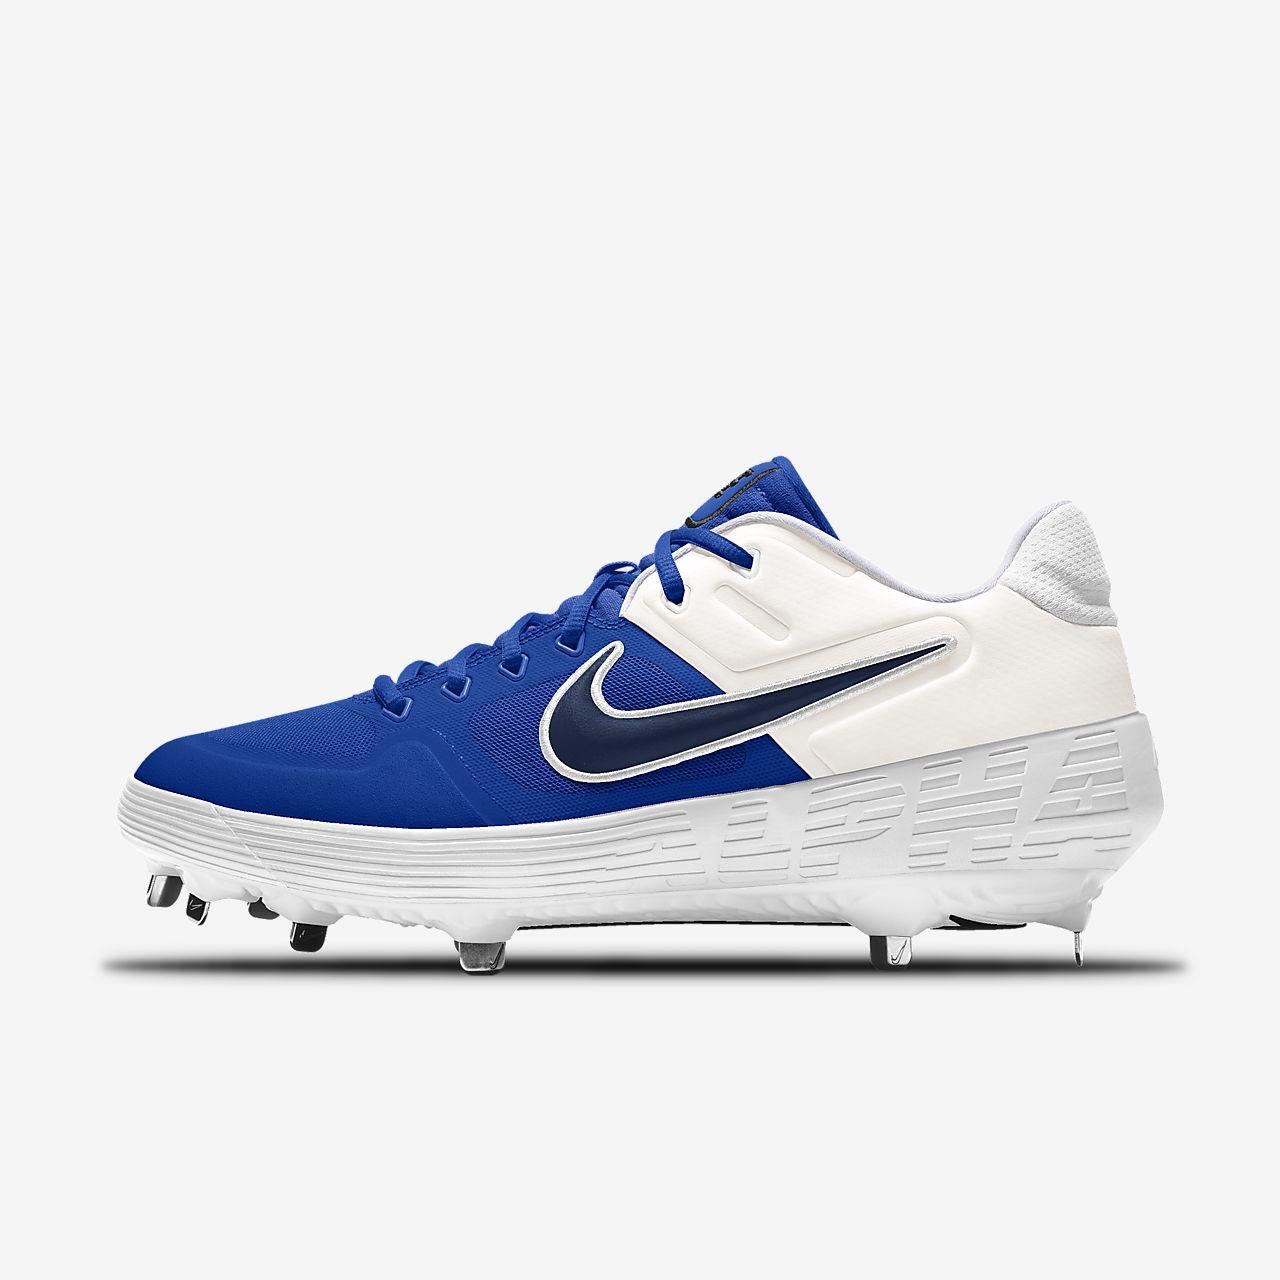 Nike Alpha Huarache Elite 2 Low By You Custom Baseball Boot